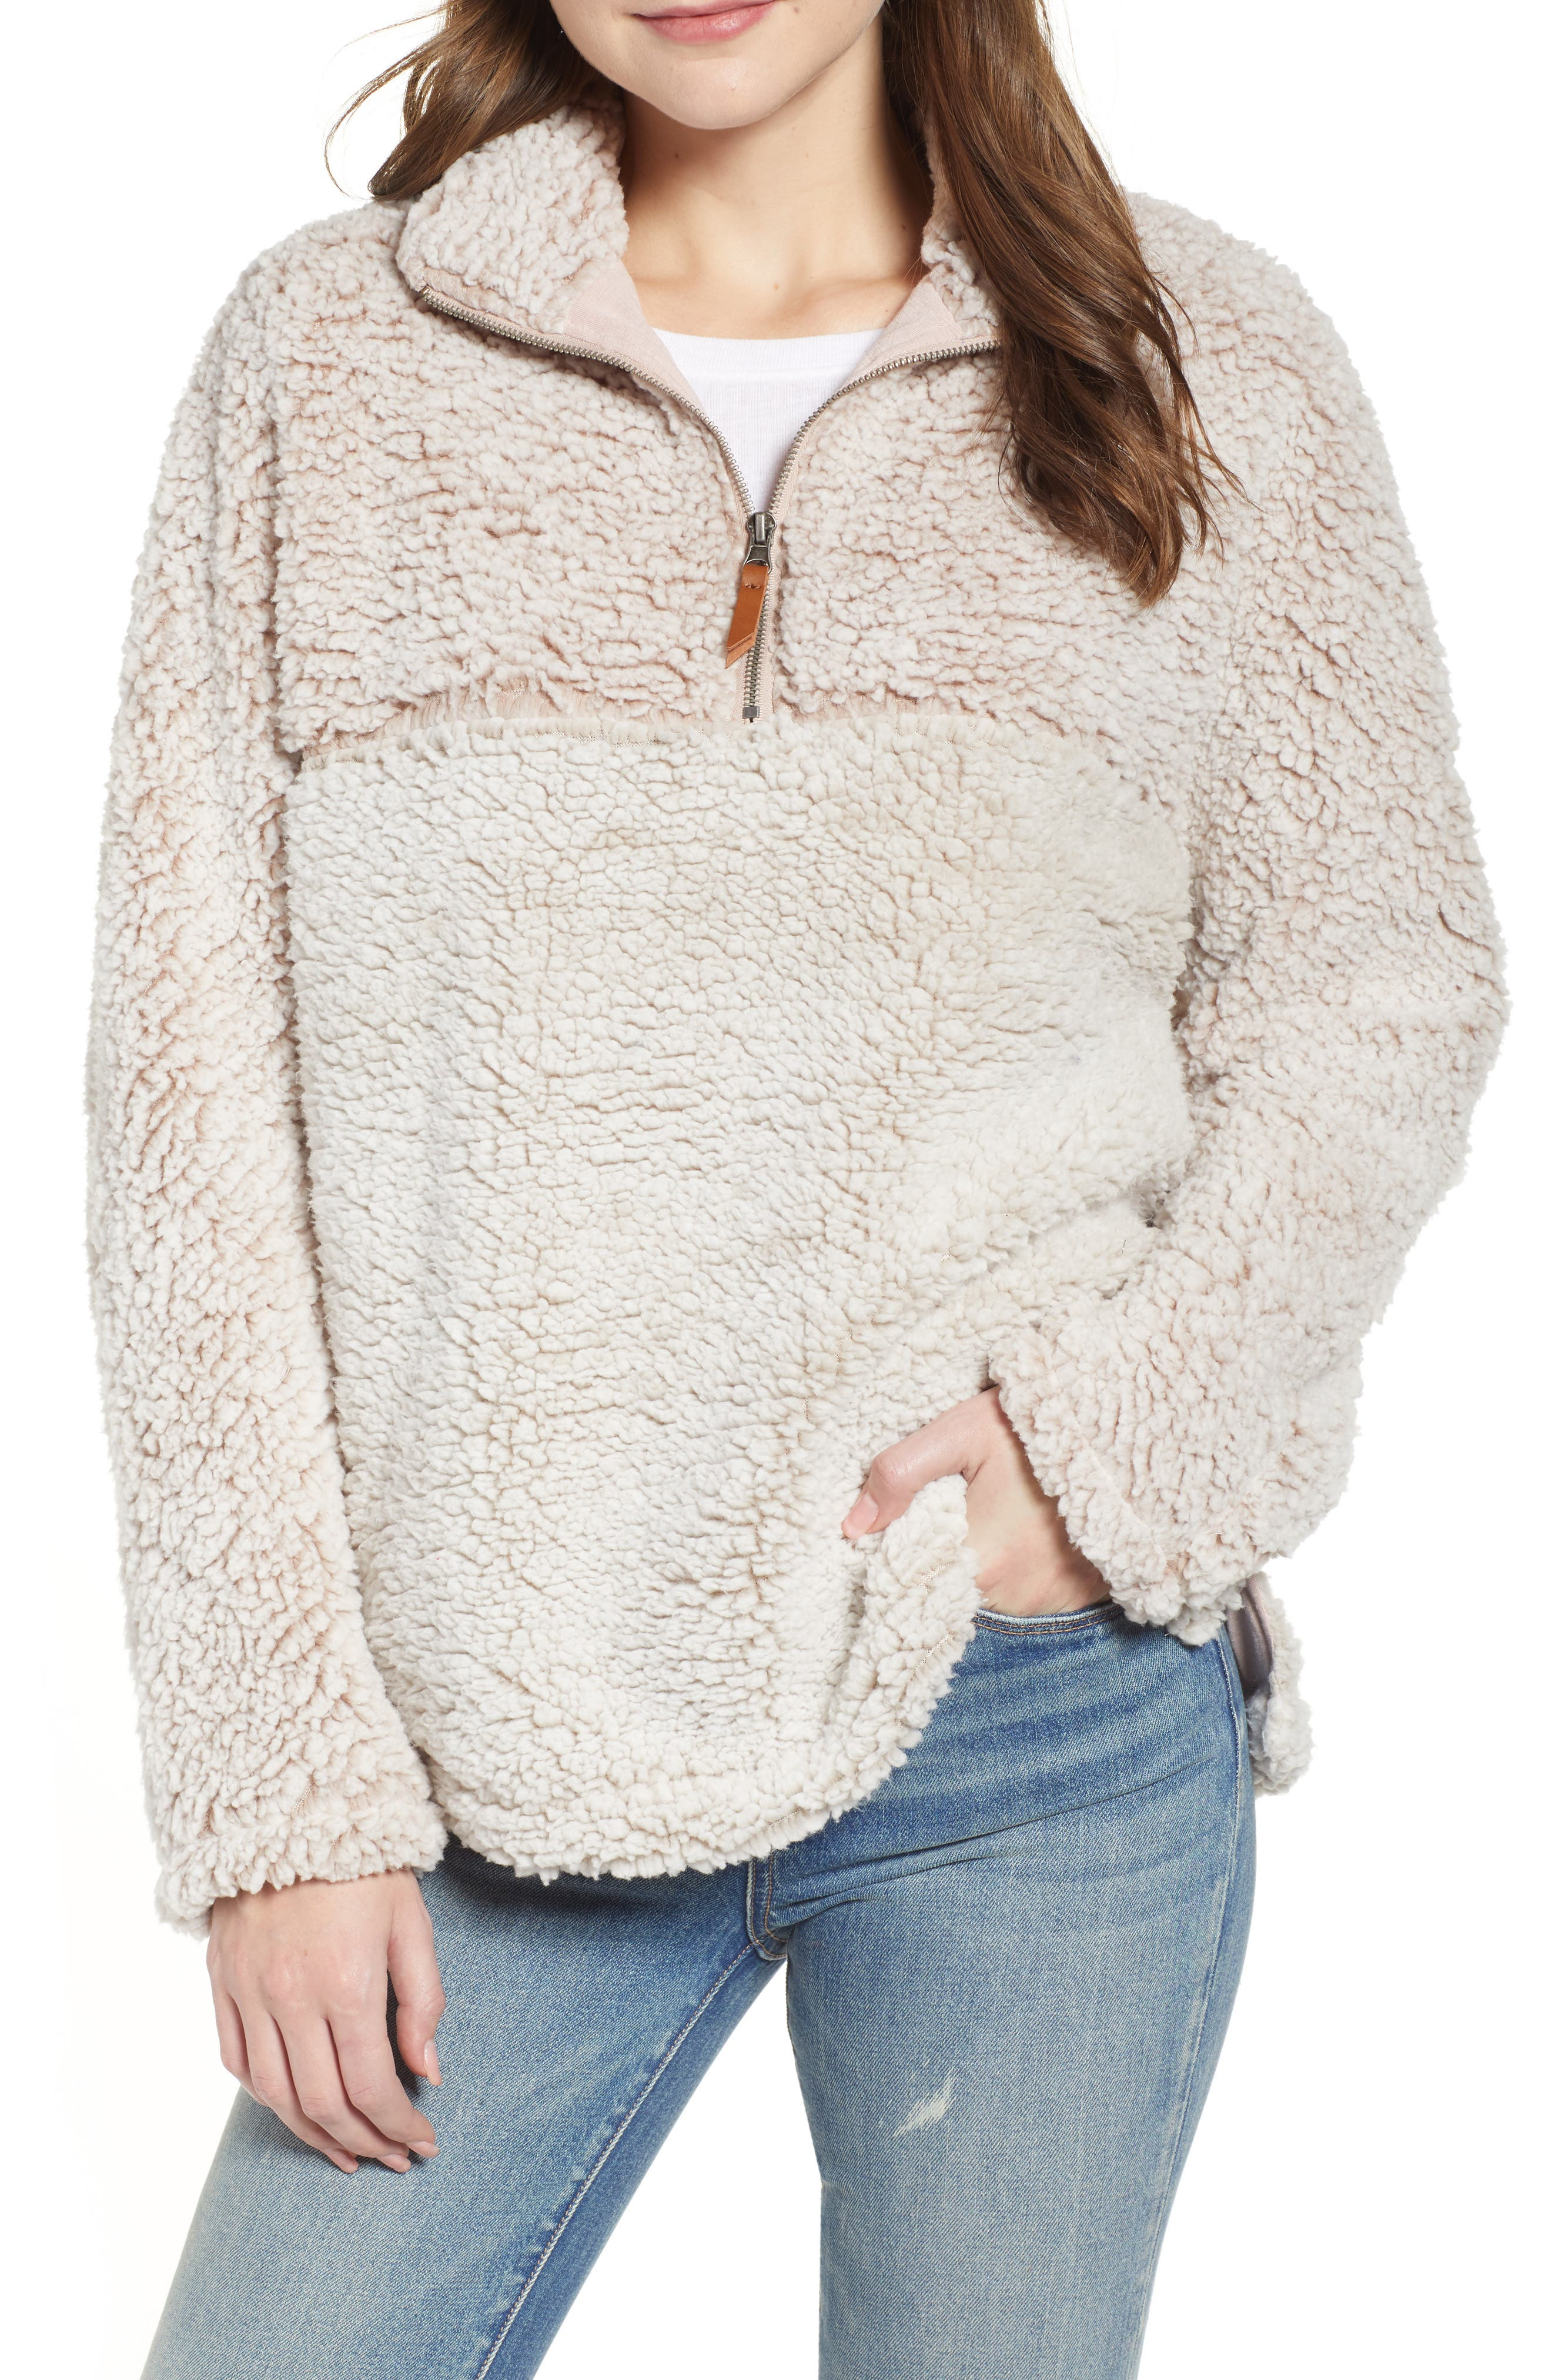 THREAD & SUPPLY, Colorblock Wubby Fleece Pullover, Main thumbnail 1, color, SMOKE ROSE IVORY